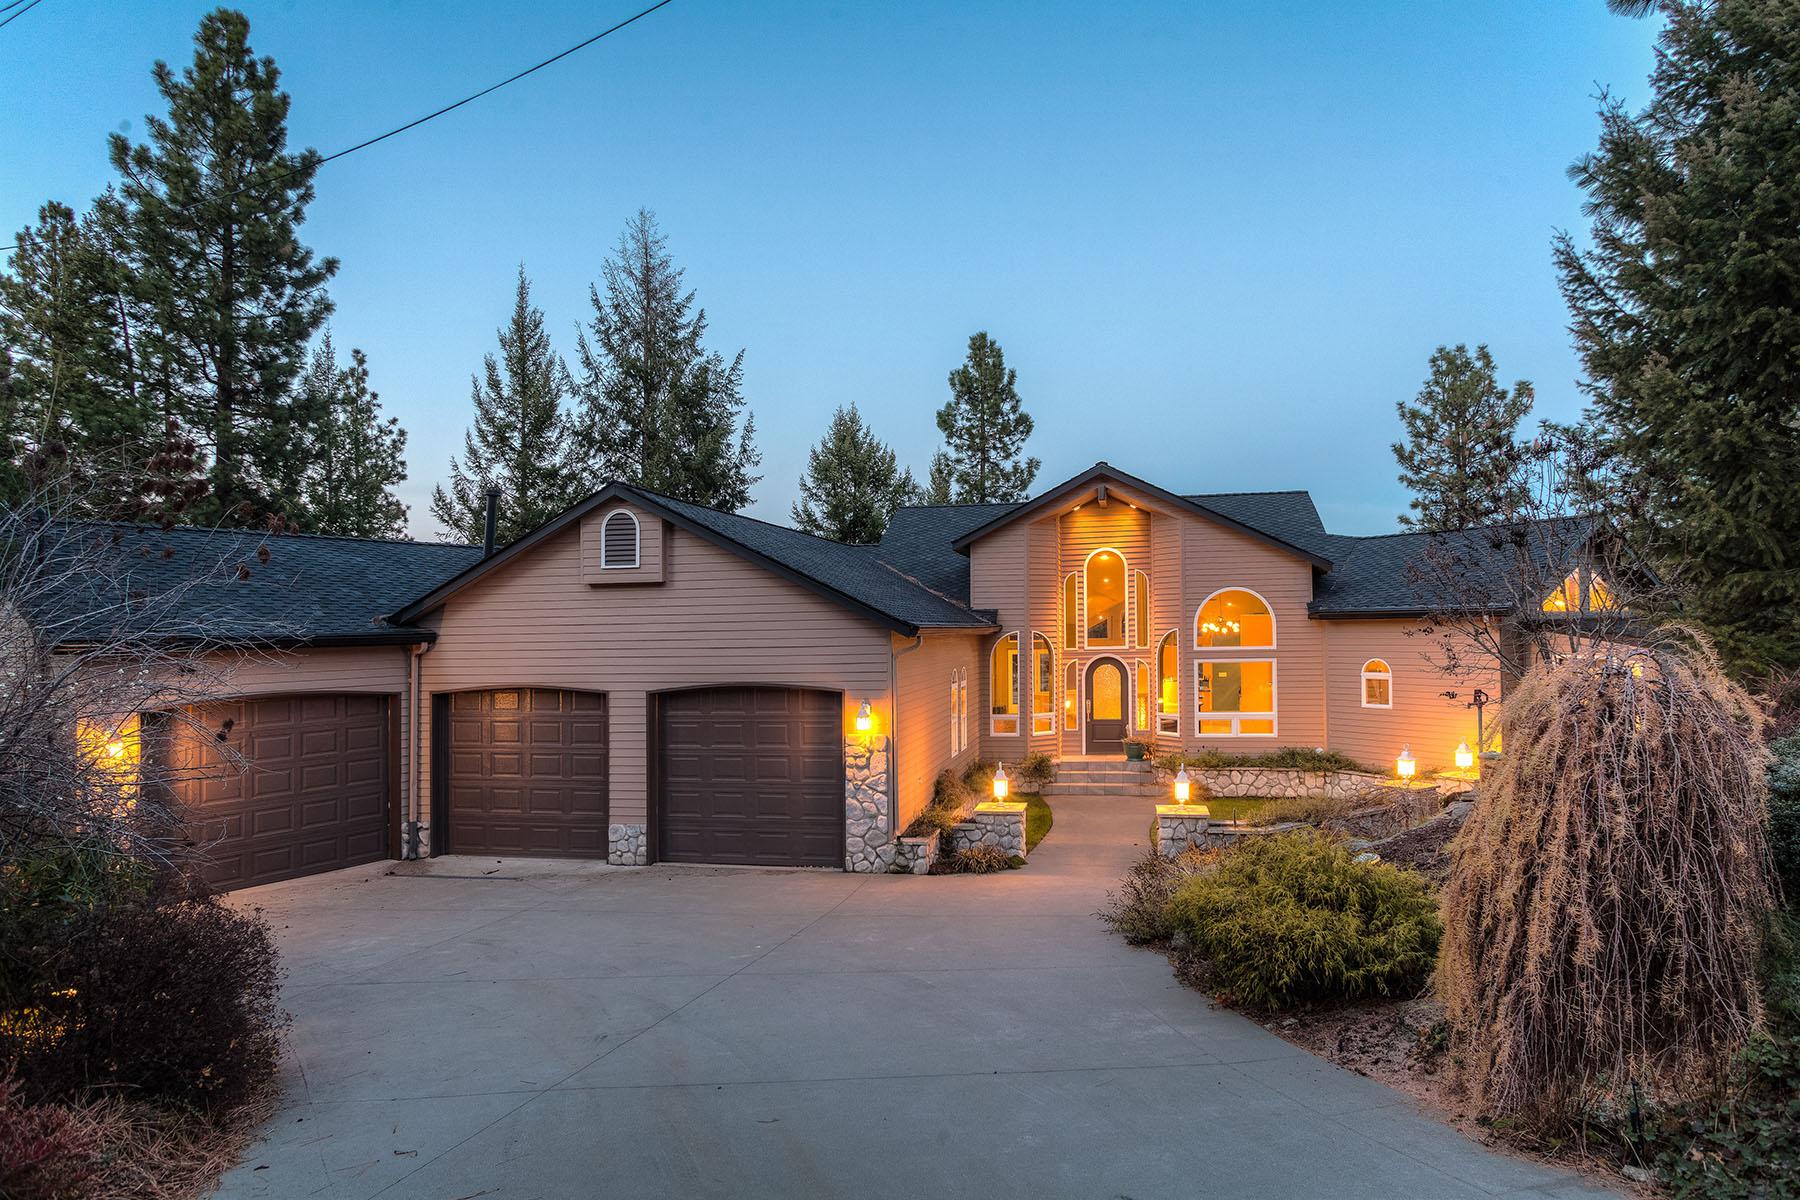 独户住宅 为 销售 在 Riverfront Contemporary Living on the Beautiful Spokane River 10439 W Shale Ct 斯特瀑布, 爱达荷州, 83854 美国